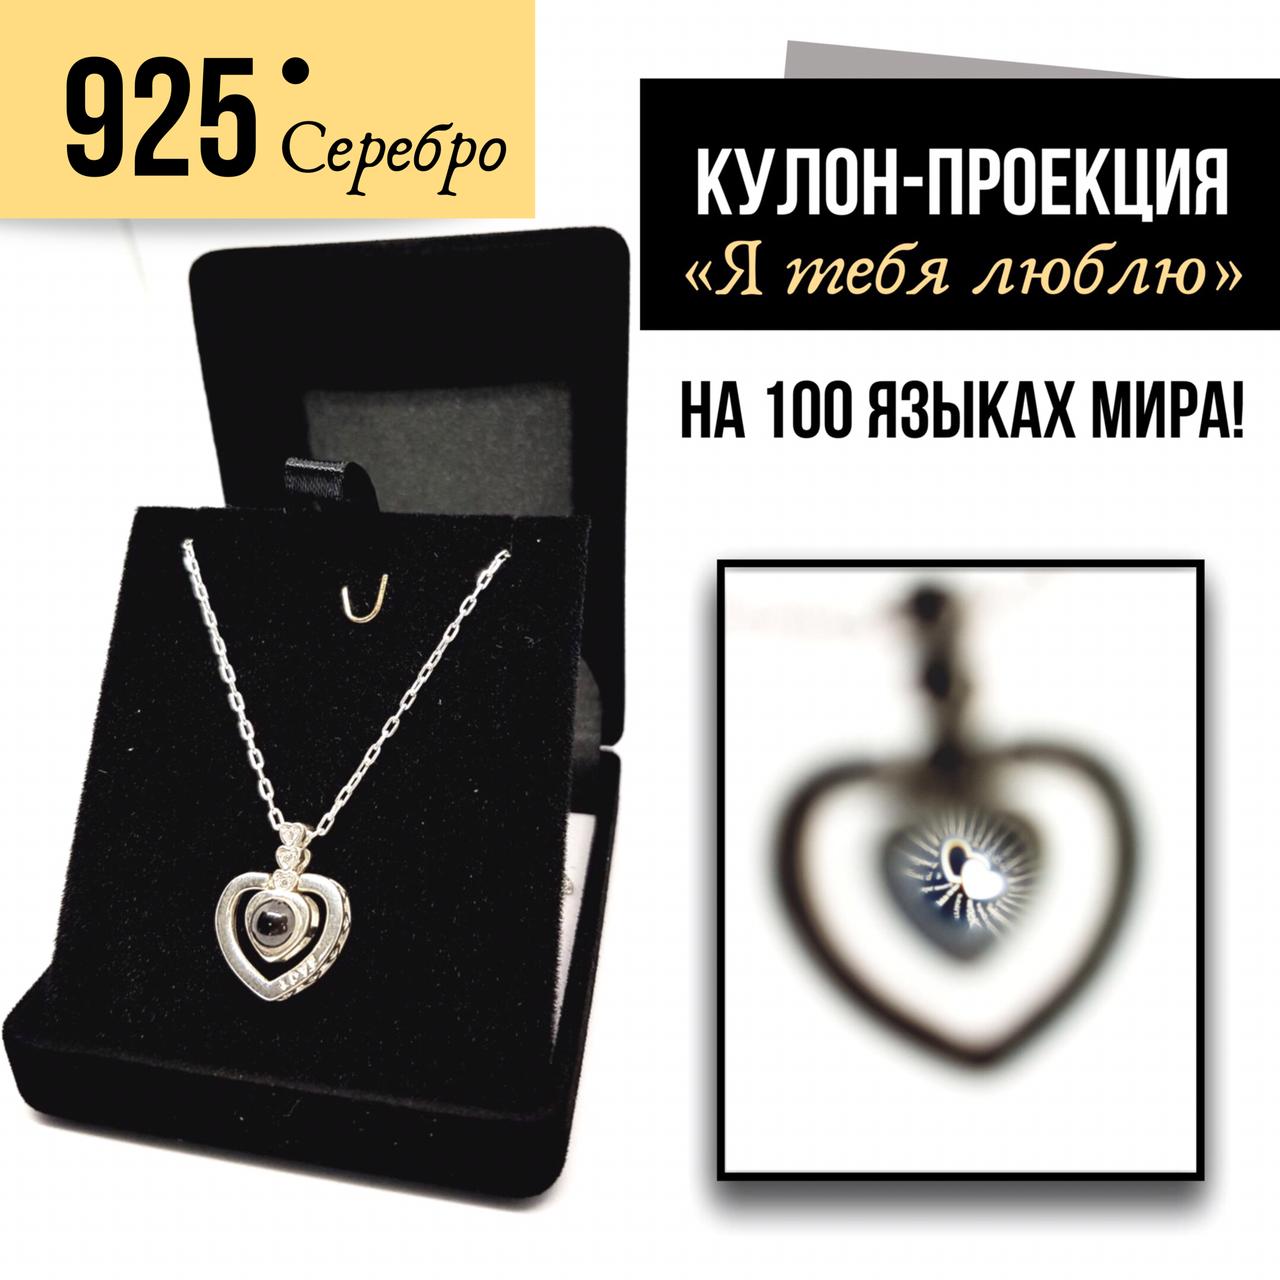 "Серебро 925 Кулон с проекцией "" Я тебя люблю"" на 100 языках мира  (SS925-11300)"